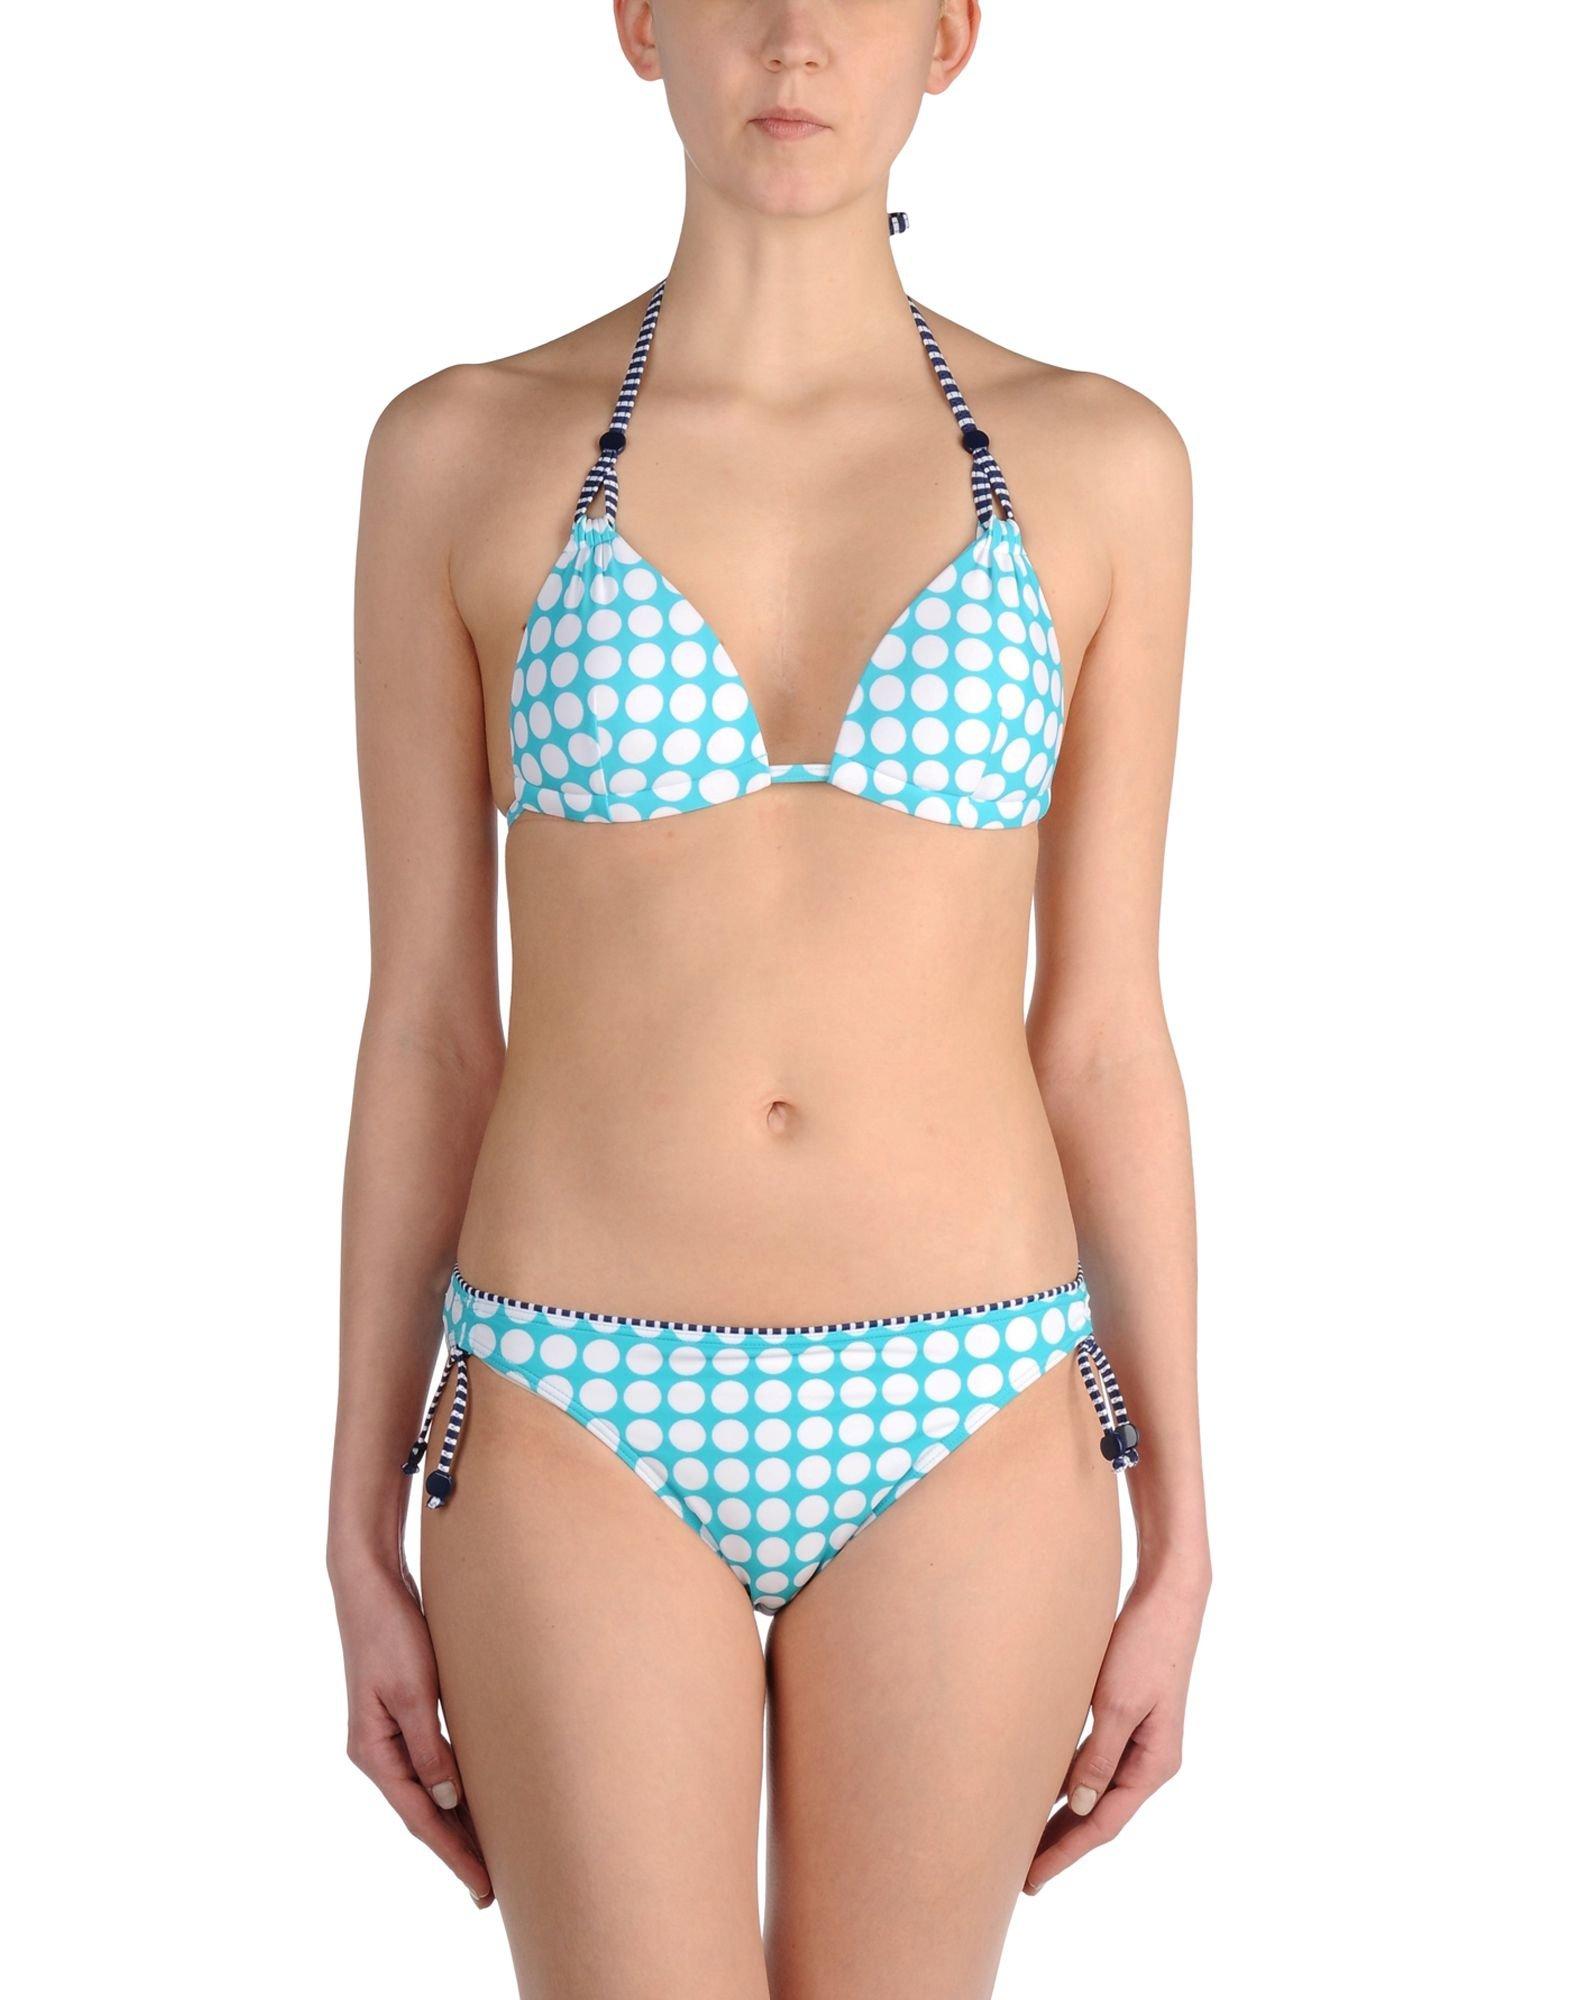 Bikini In Esprit In Lyst Esprit Bikini Esprit Blue Blue Lyst PuXZiwkTO